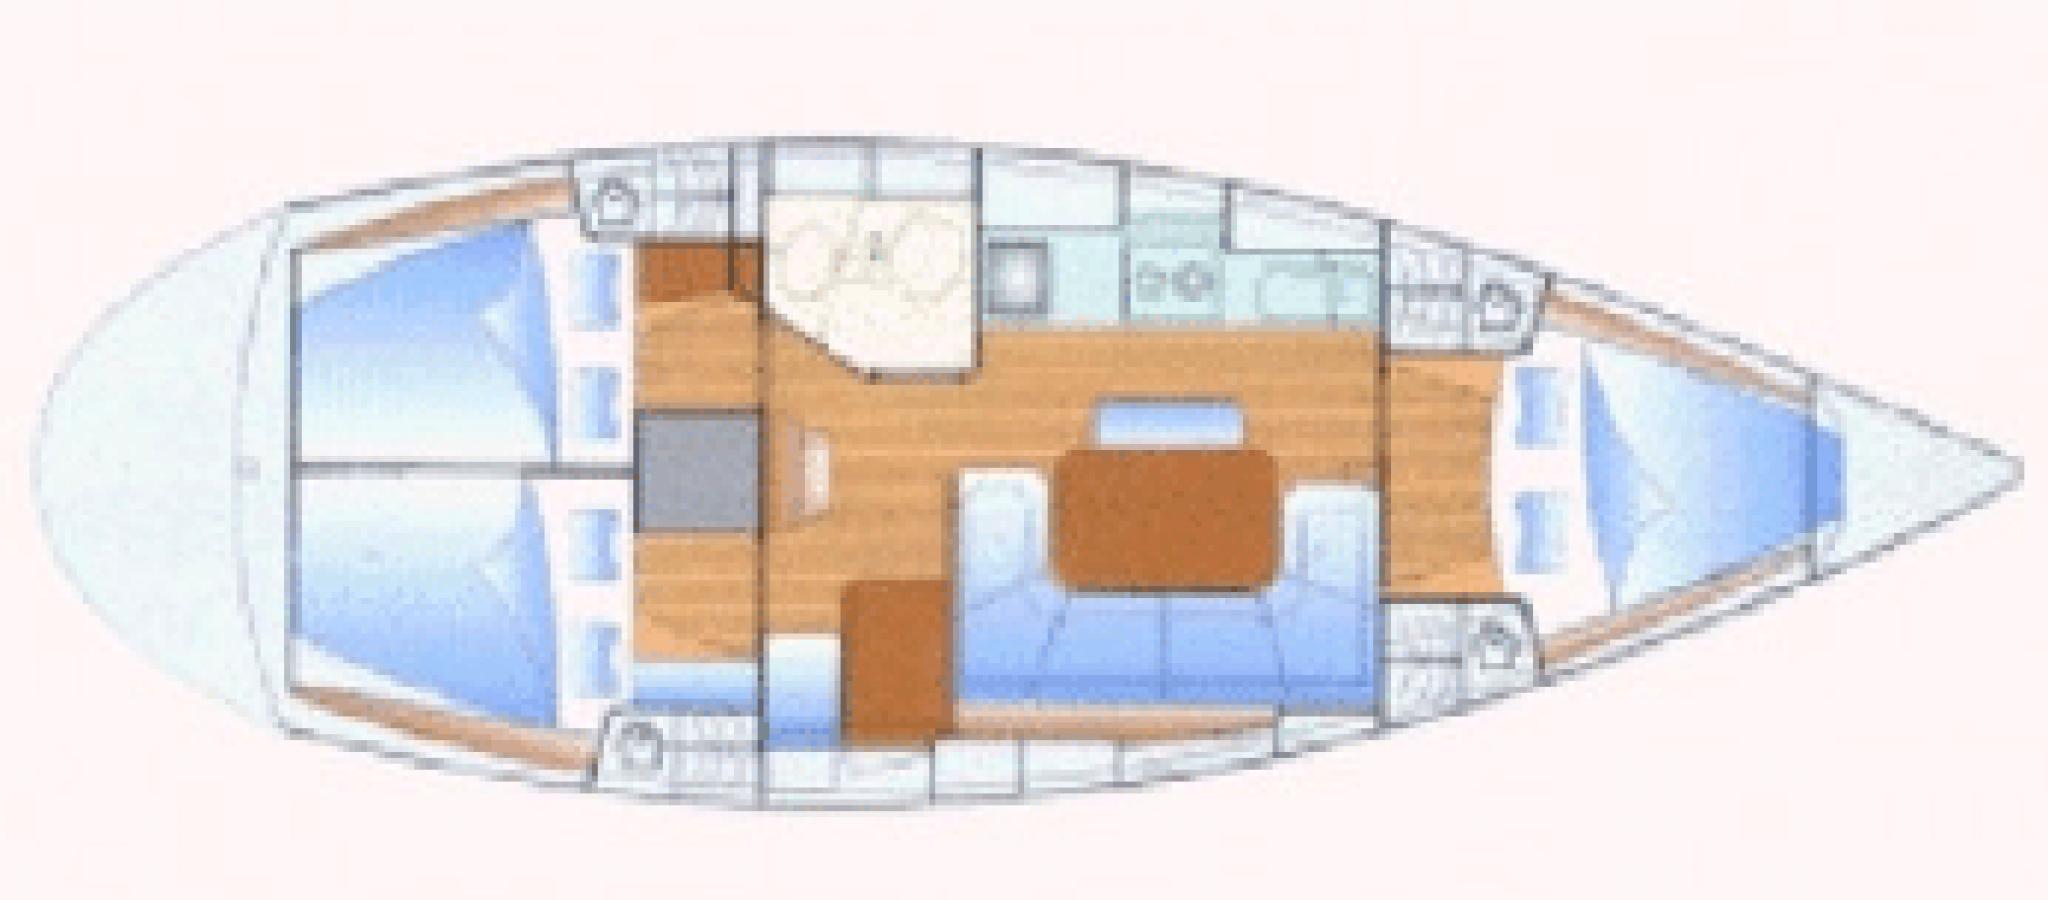 Bavaria 37 cruiser plan 3 cabines